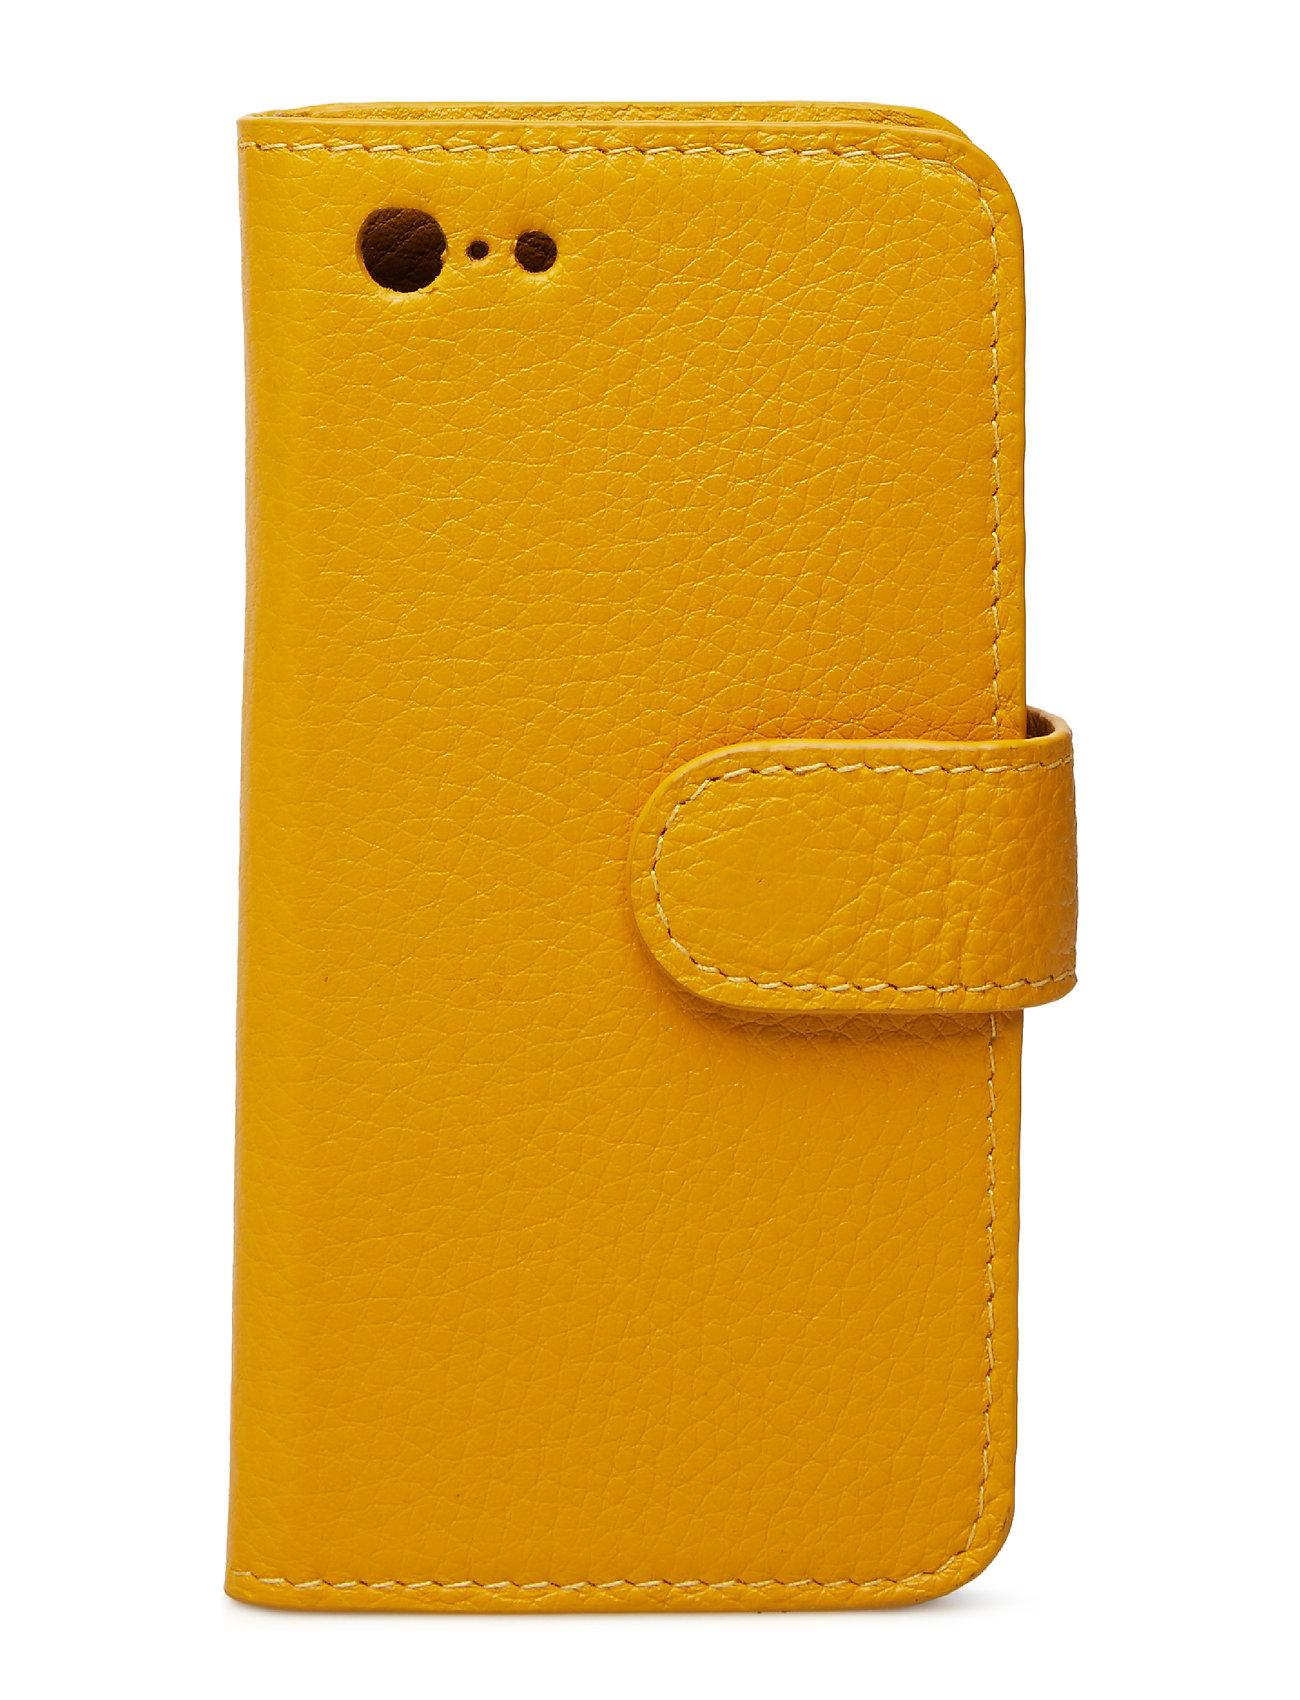 Cormorano Iphone Cover 7+8 Sika - Adax